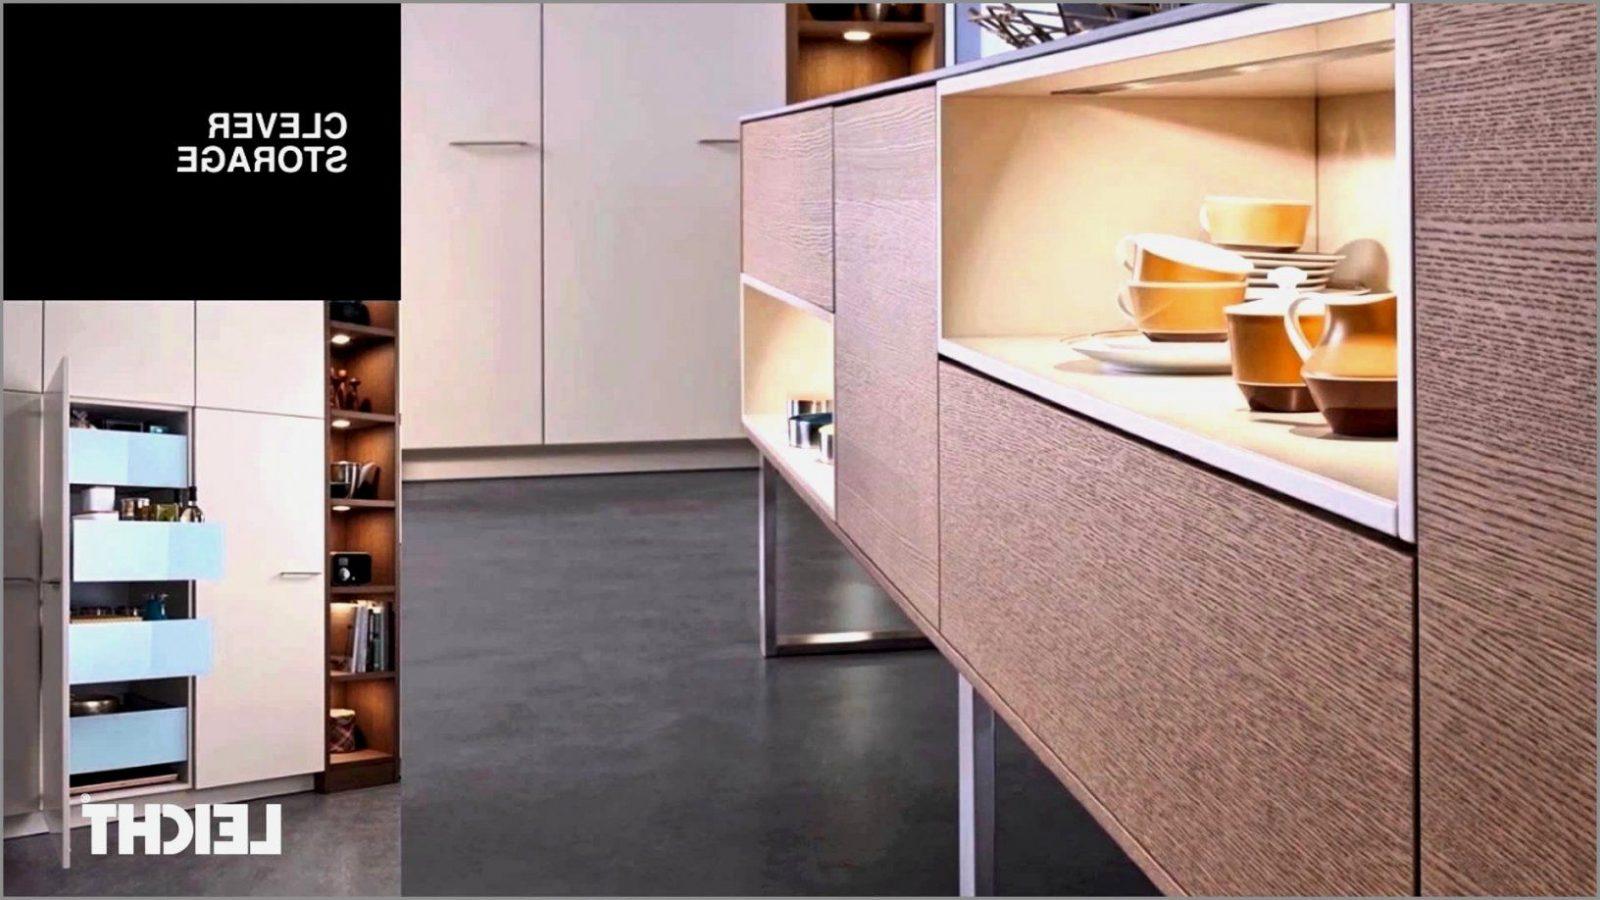 Küche Spritzschutz Wand Selber Machen | Kuche Spritzschutz Selber Machen